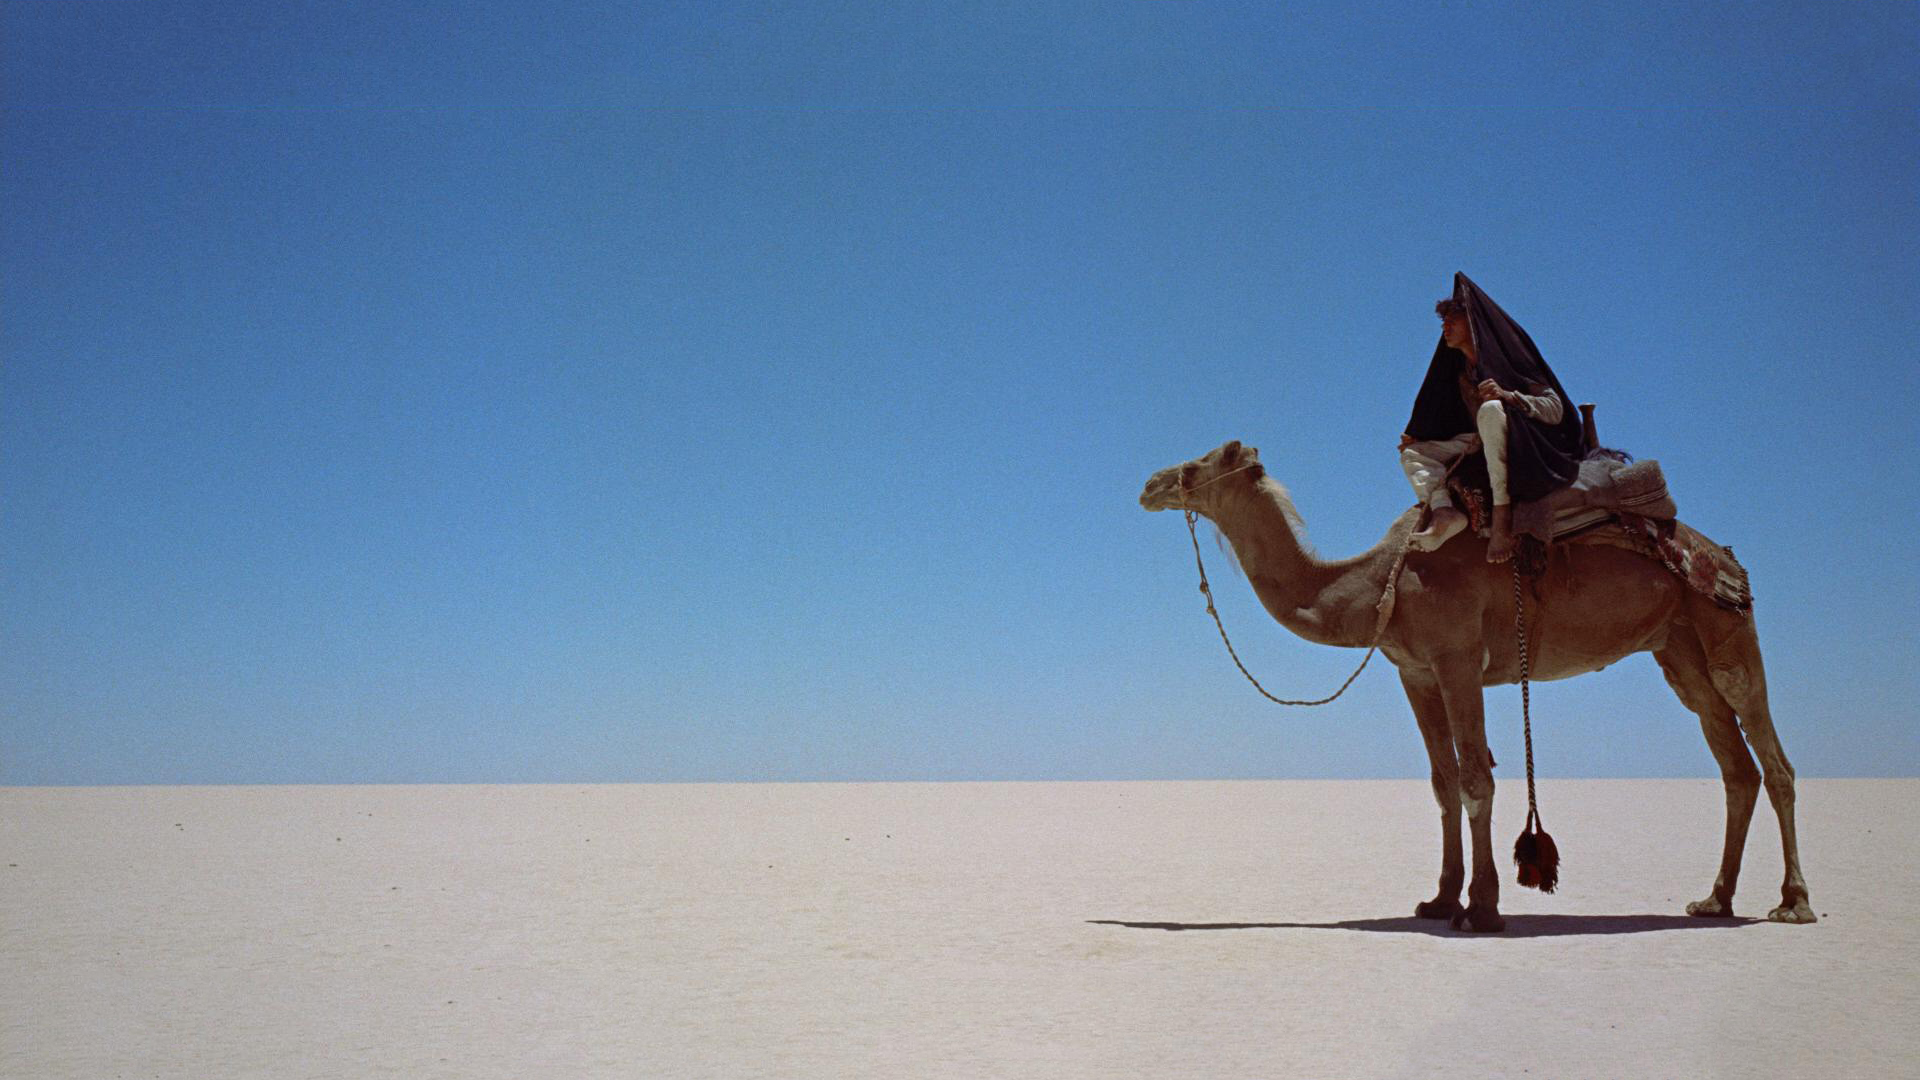 Lawrence of Arabia [1920x1080] wallpapers Favorite film scenes 1920x1080